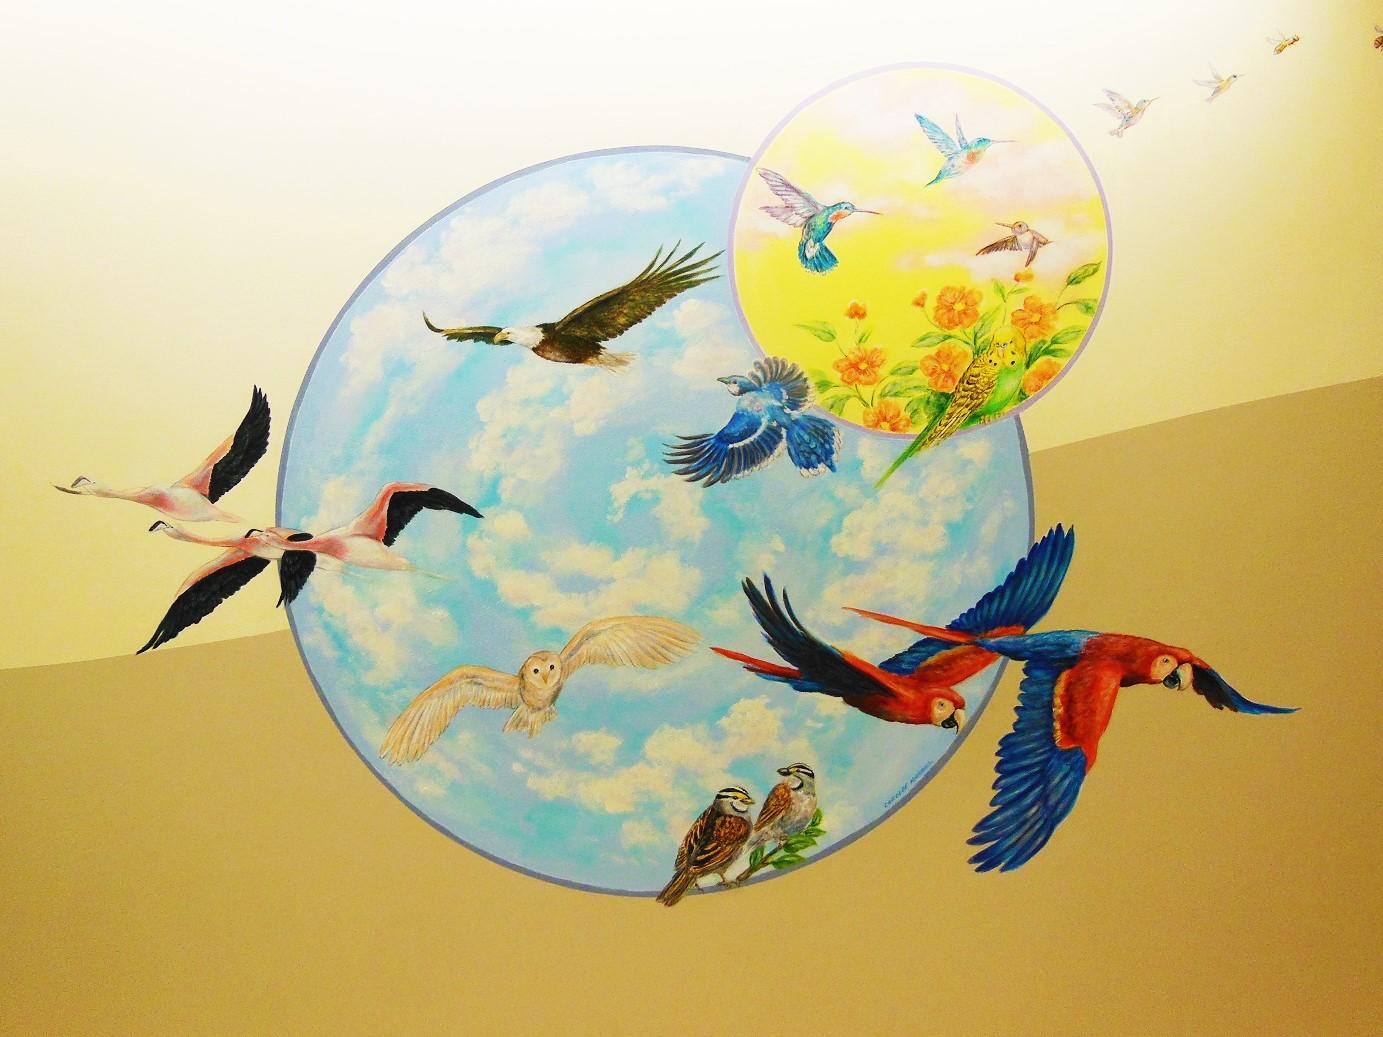 Choc Hospital Mural - Muralist Carolee Merrill